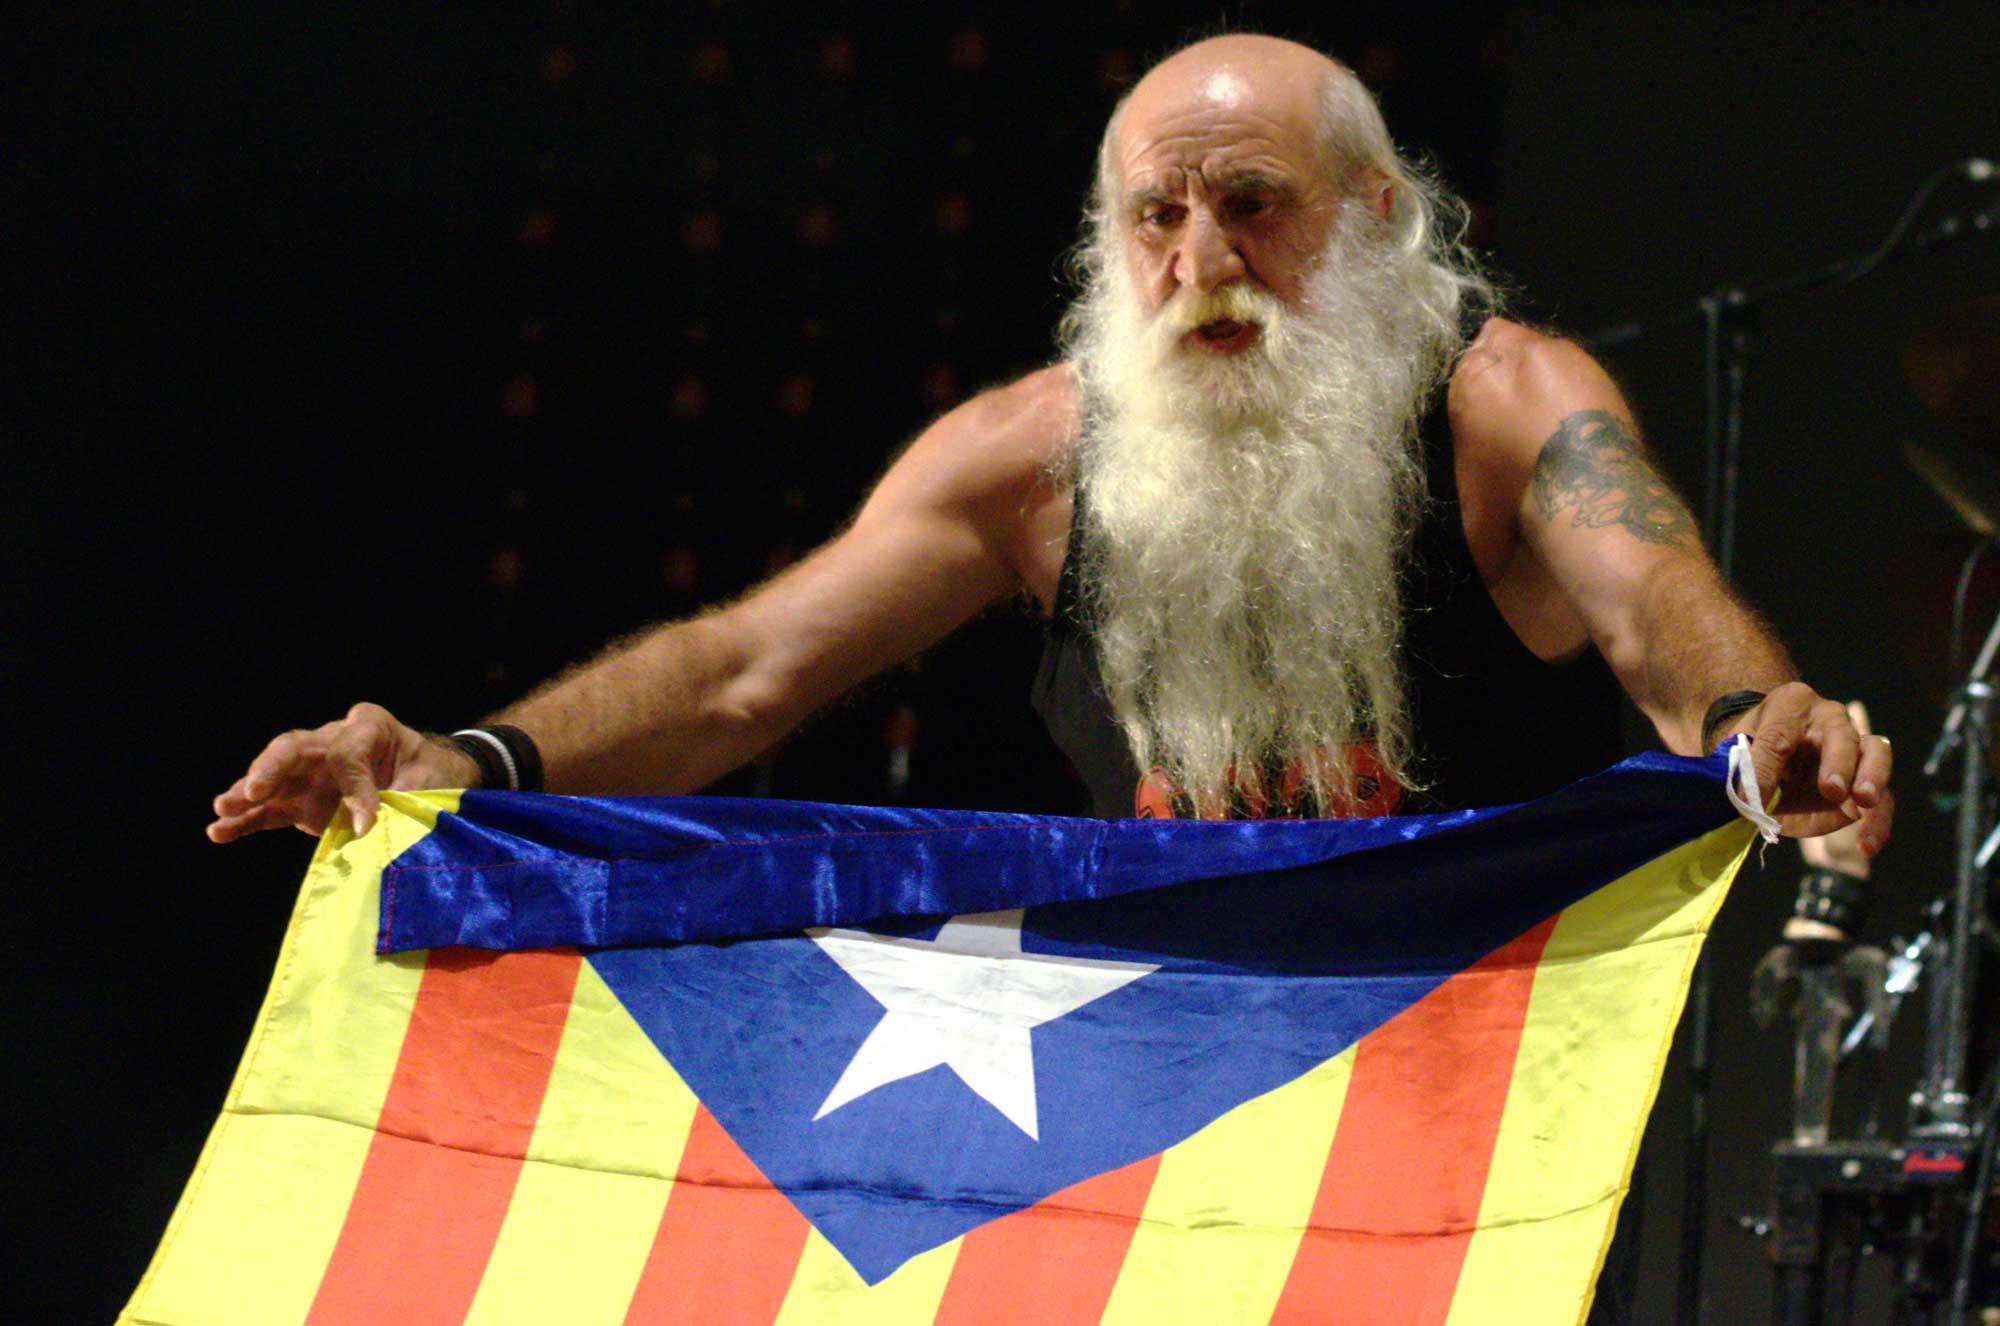 Martín Rodríguez, the charismatic drummer of Sangtraït, dies